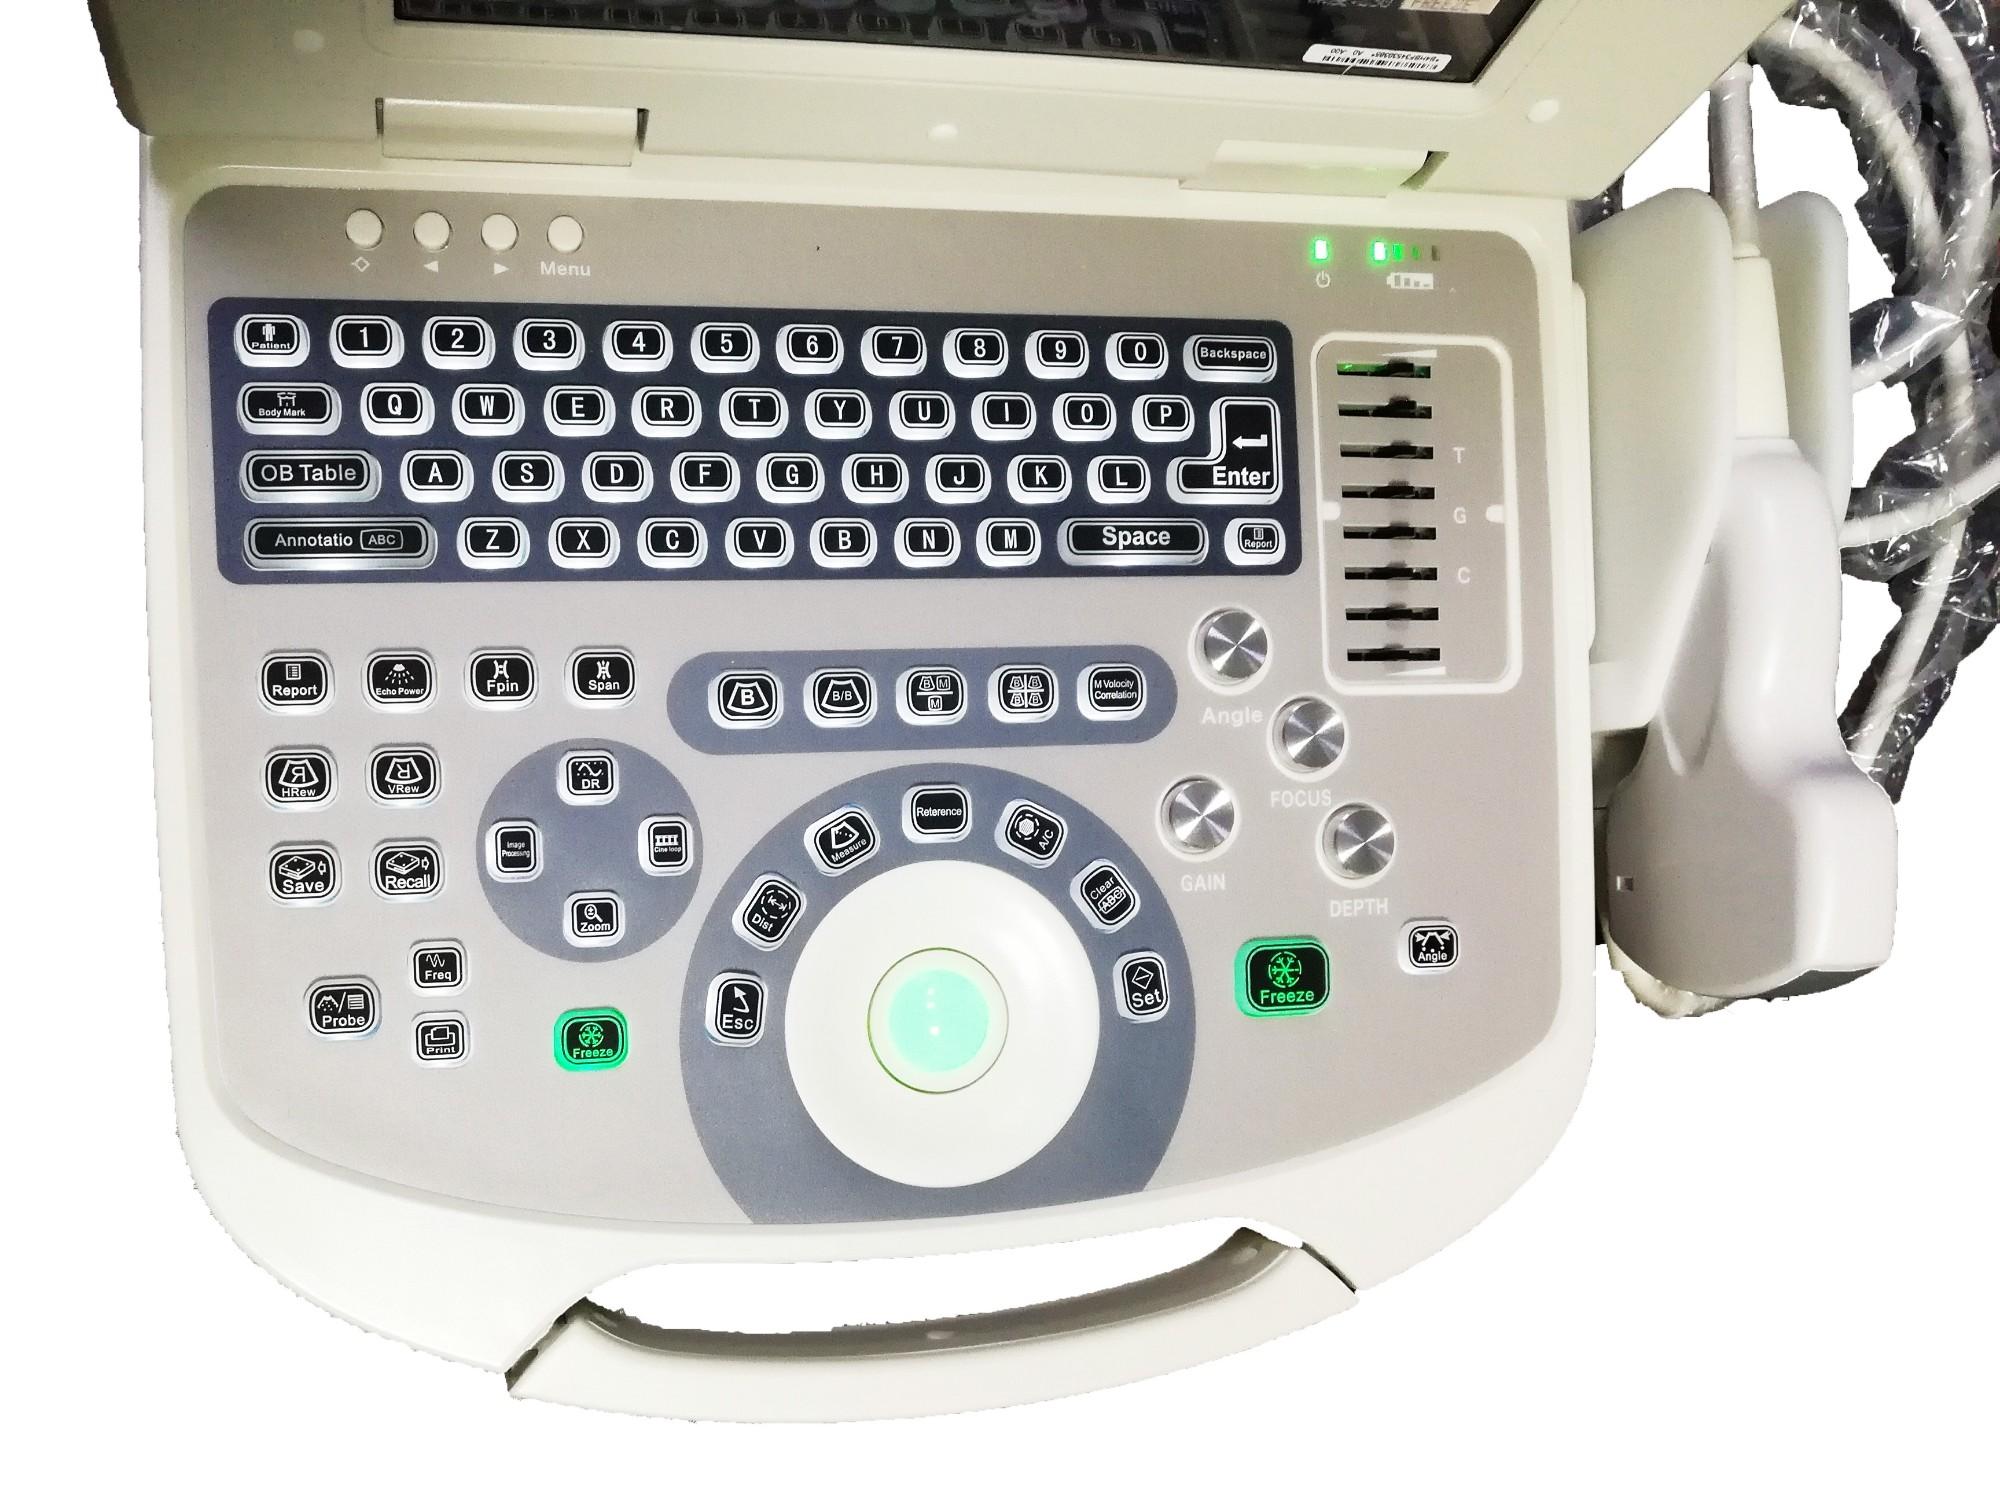 Wholesale Ultrasound Machine Price Manufacturers, Wholesale Ultrasound Machine Price Factory, Supply Wholesale Ultrasound Machine Price